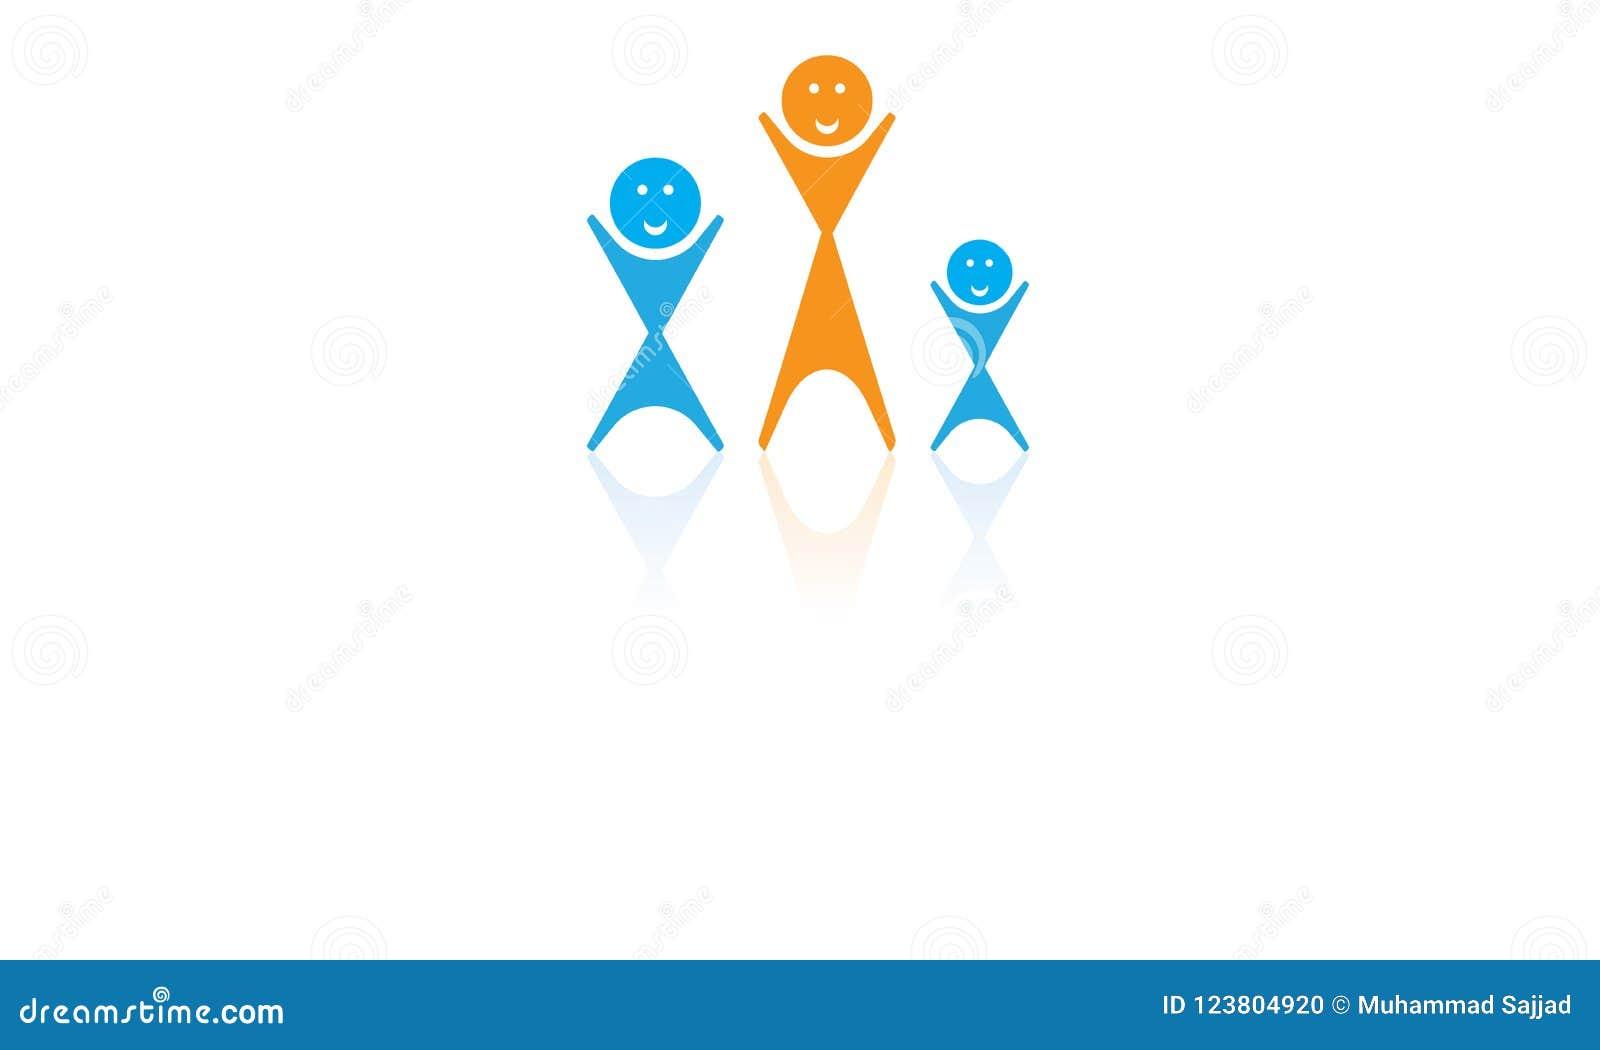 Familien-Verbands-Logo - Familien-Leute-Baum-Logo - Verbands-glückliche Familie Logo Template